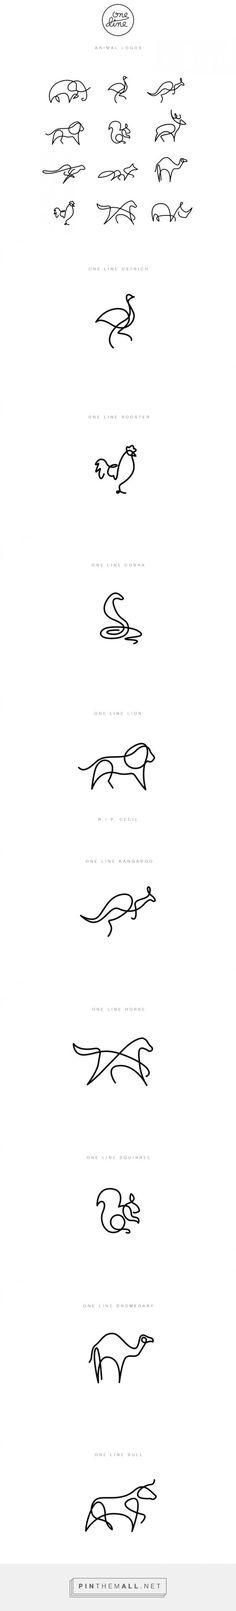 Desenhos minimalistas delineiam logos de animais - created via https://pinthemall.net: